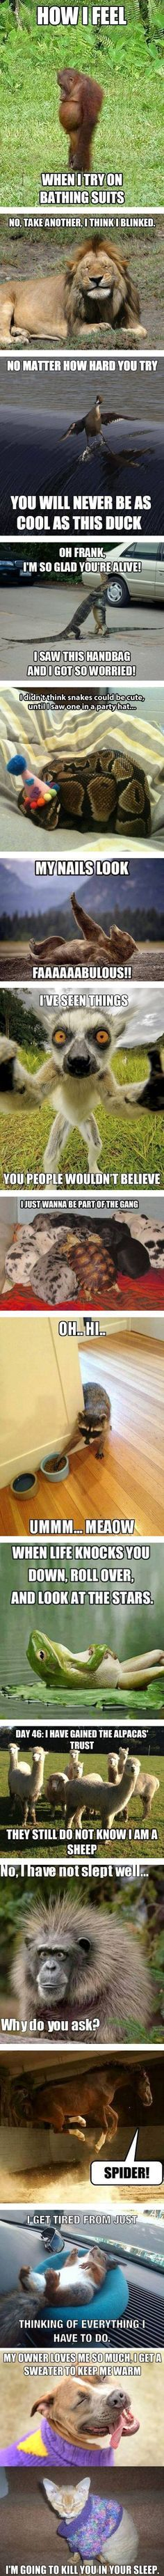 Cute Animals #funny #humor